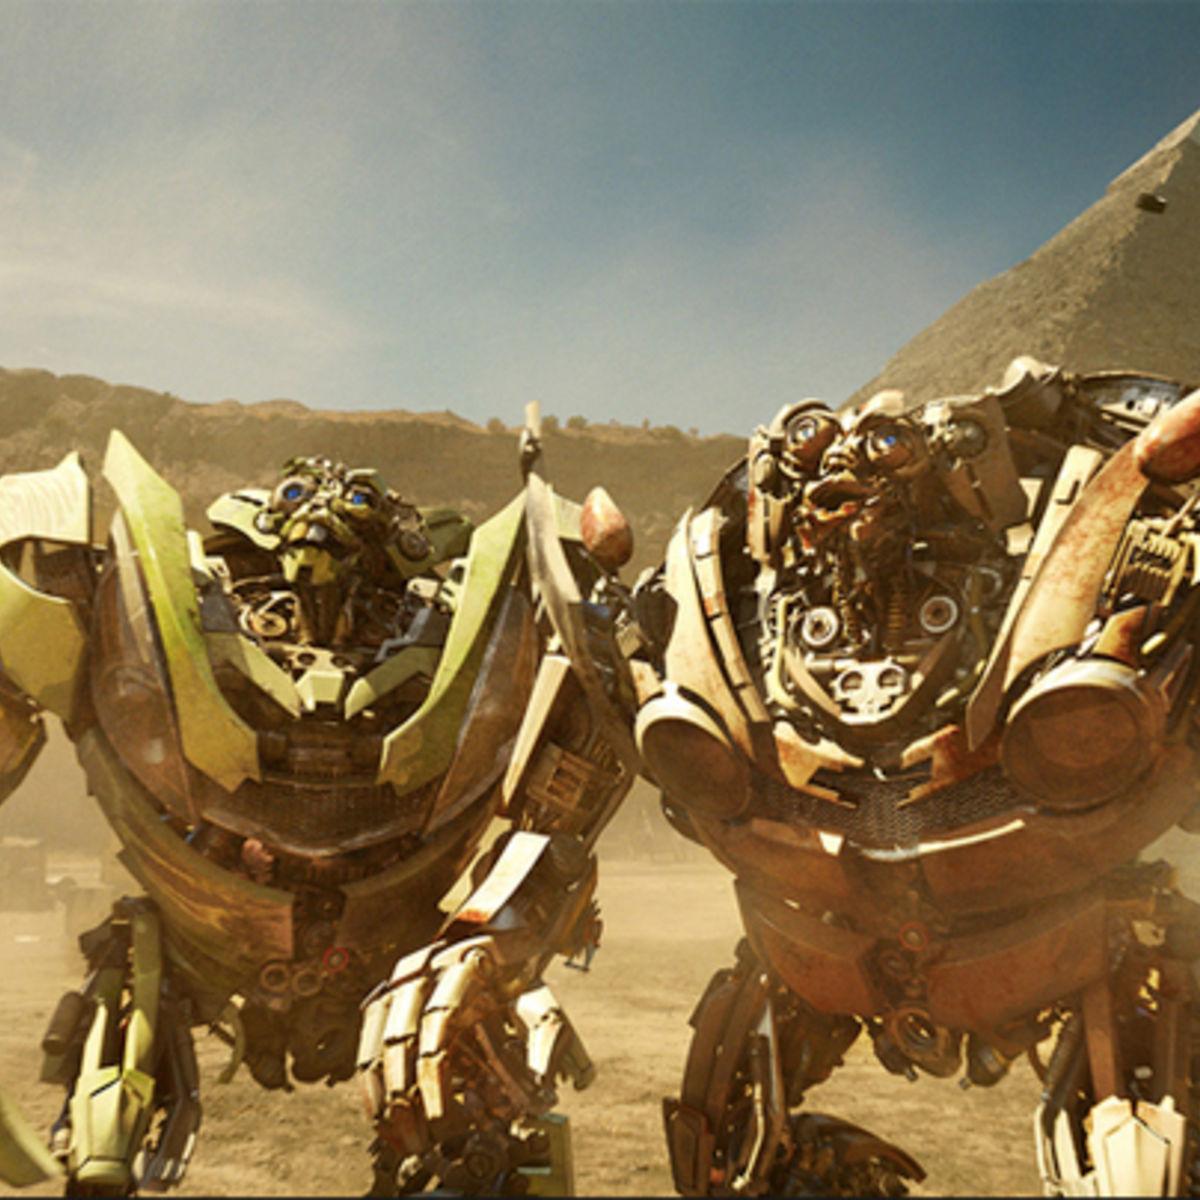 ControversyTransformers_0.jpg